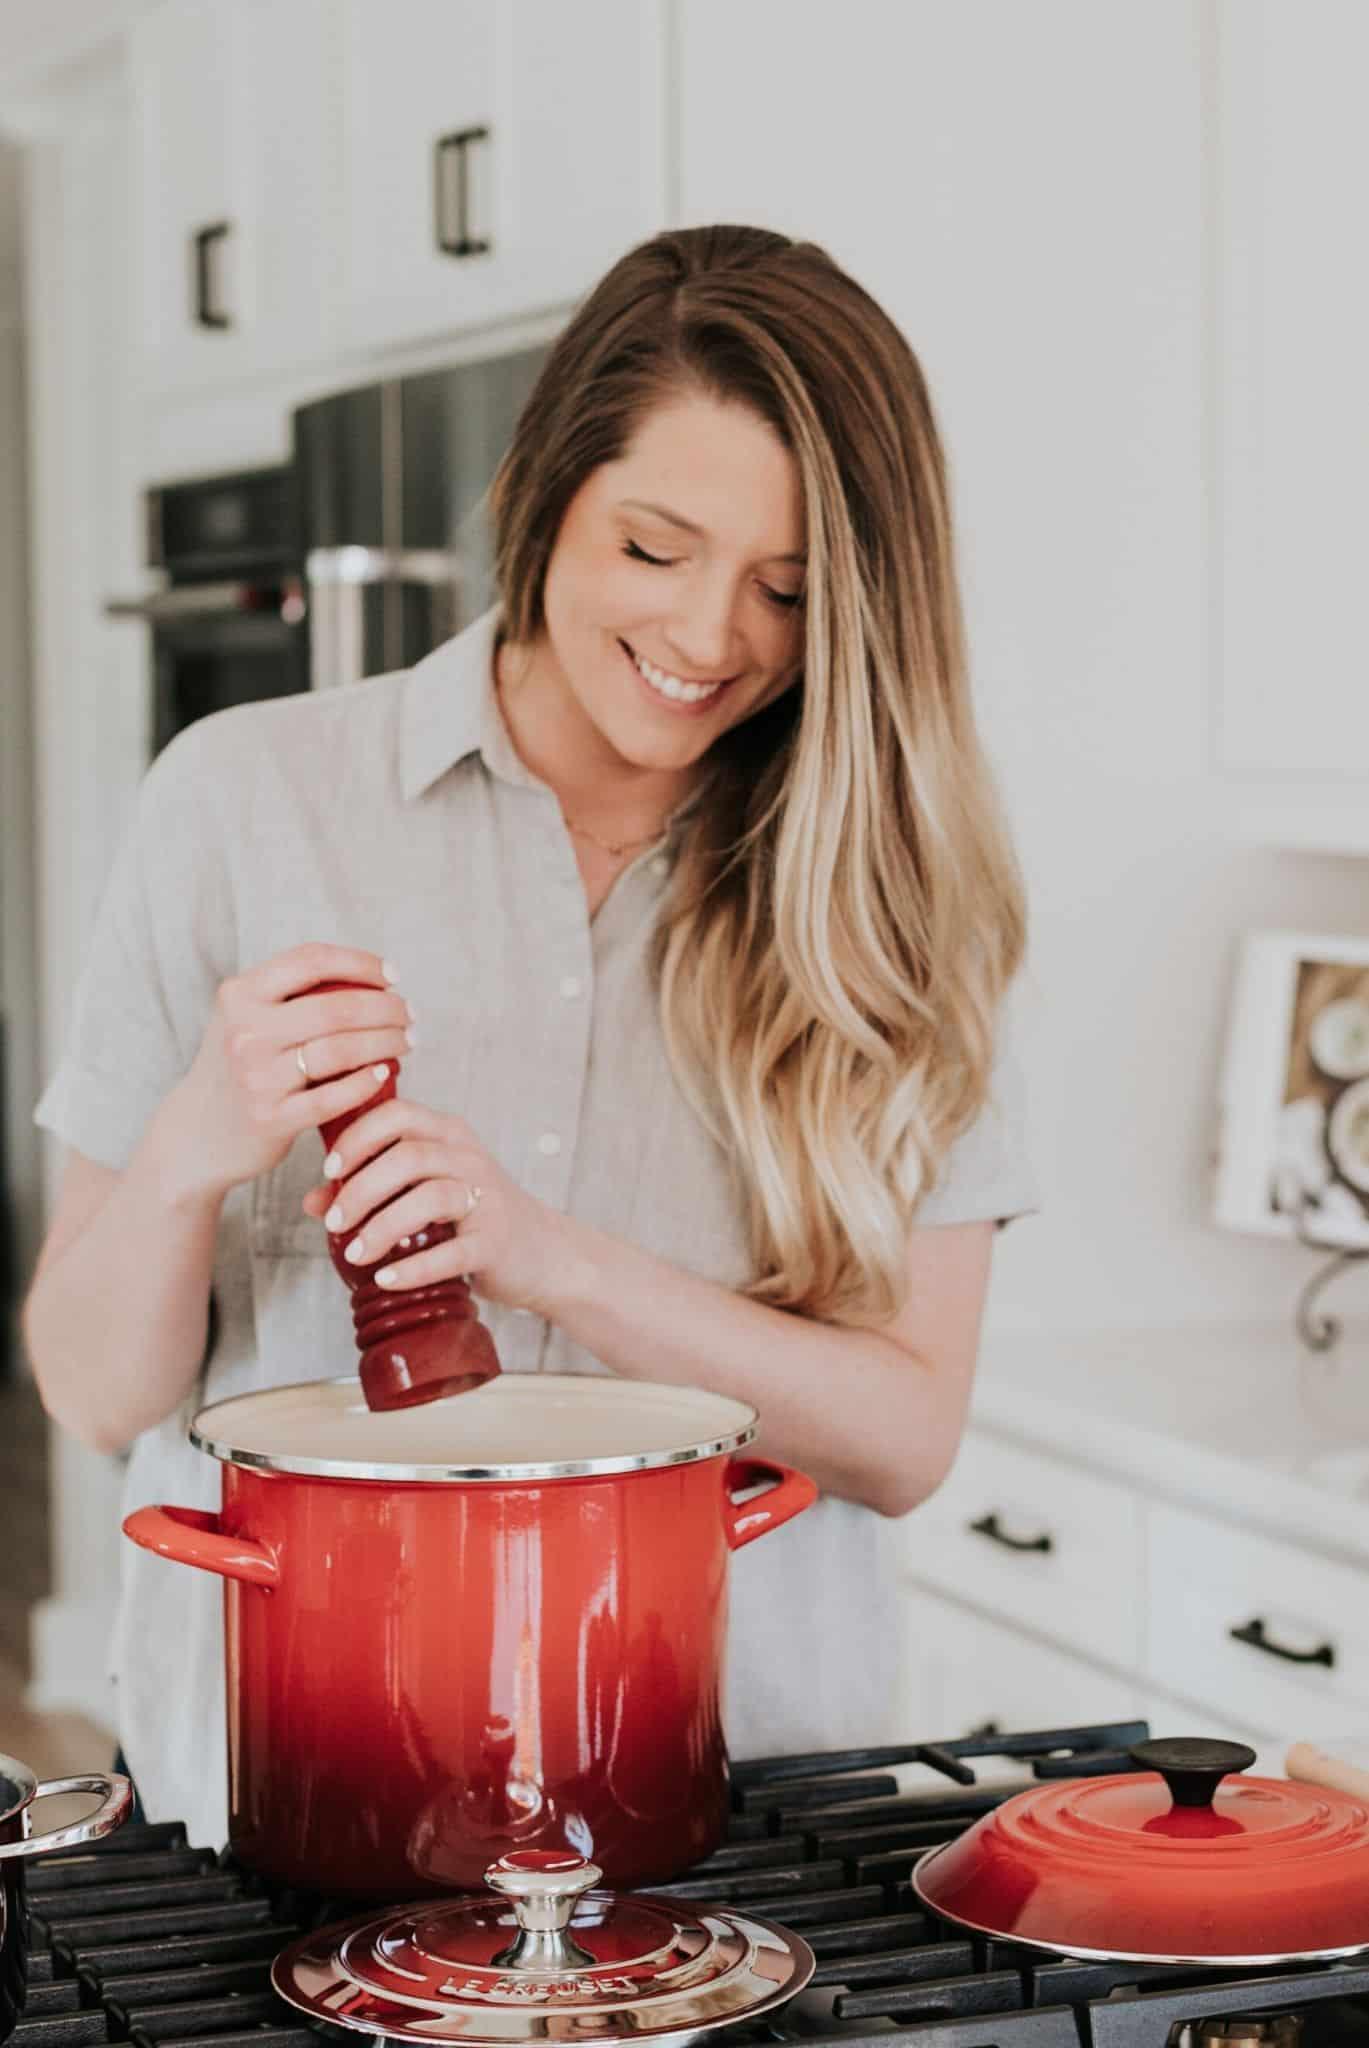 Woman adding salt to a pot on the stove